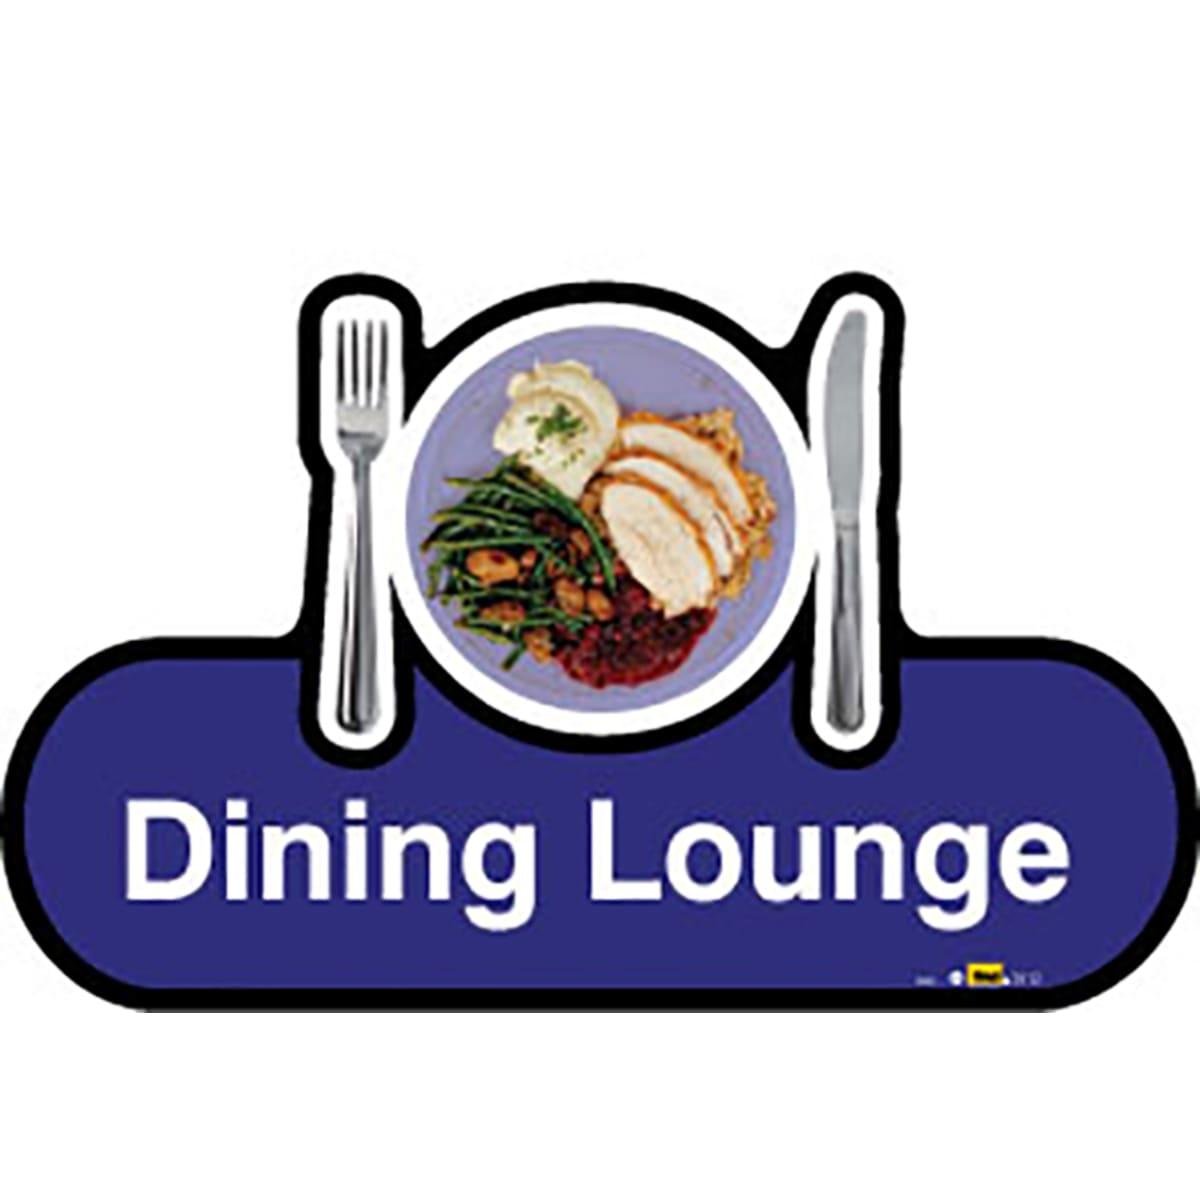 Dining Lounge - Dementia Signage